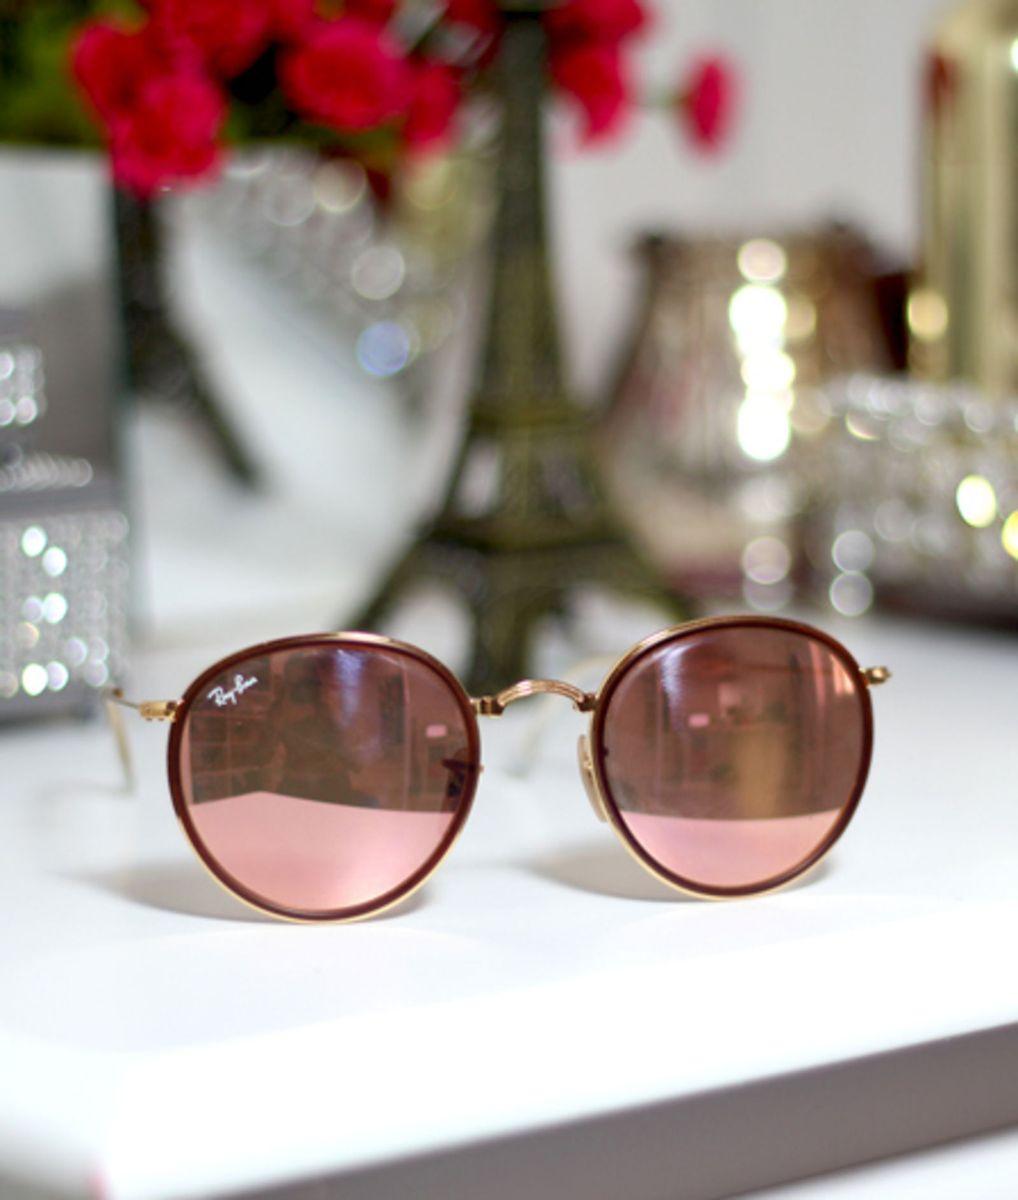 d7c6e35f1 Óculos de Sol Ray Ban Round Rose Dobrável | Óculos Feminino Ray Ban ...